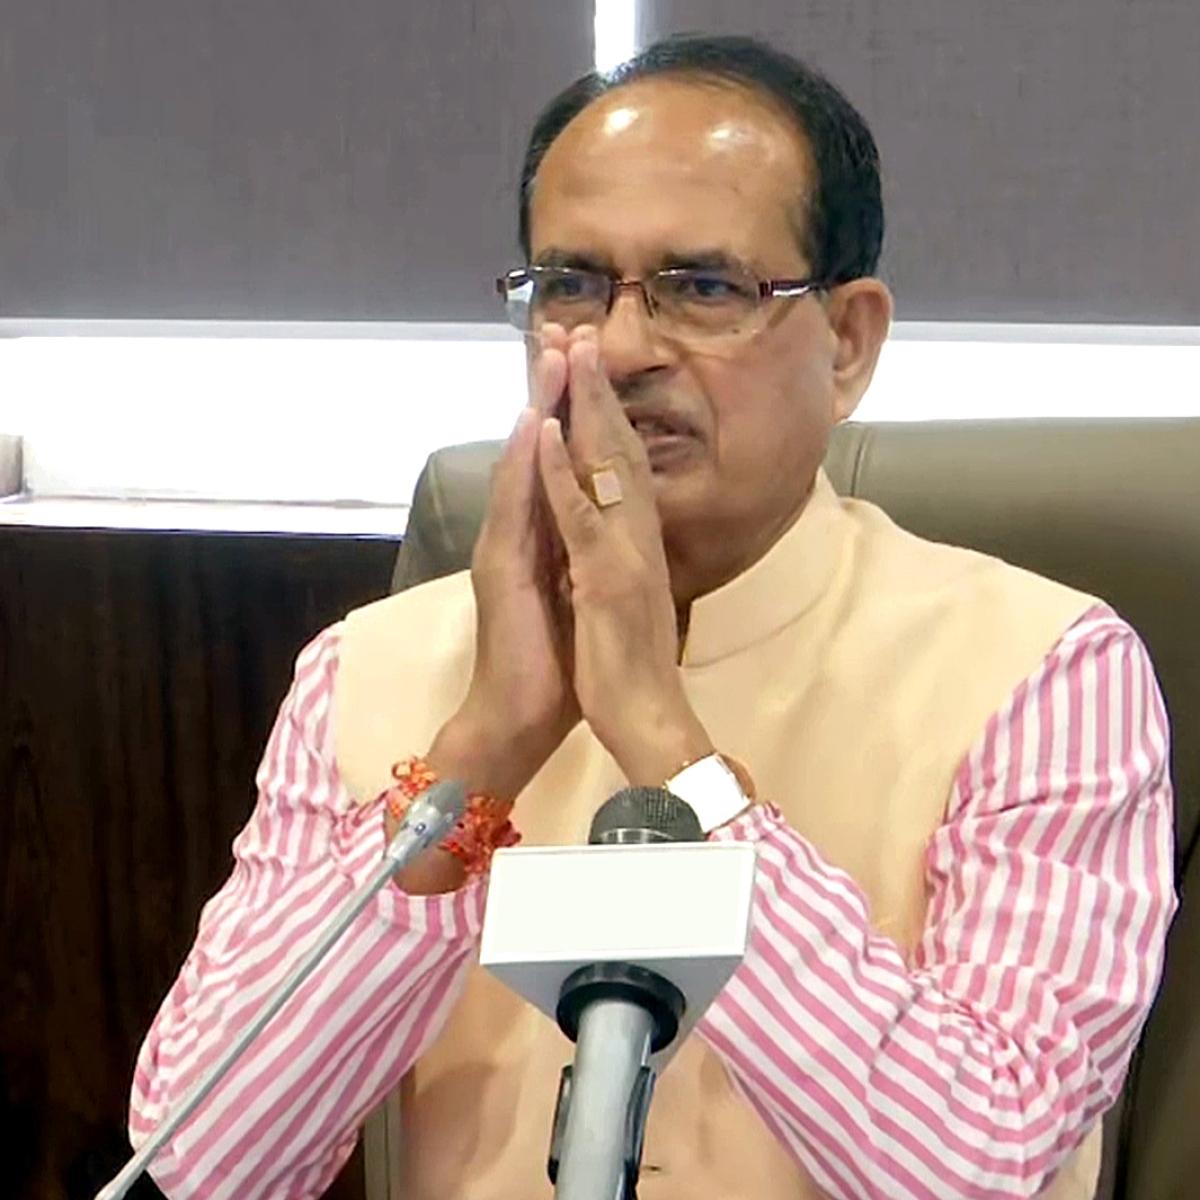 Electricity bills reduced to half: CM Shivraj Singh Chauhan at Jan Samvad Programme